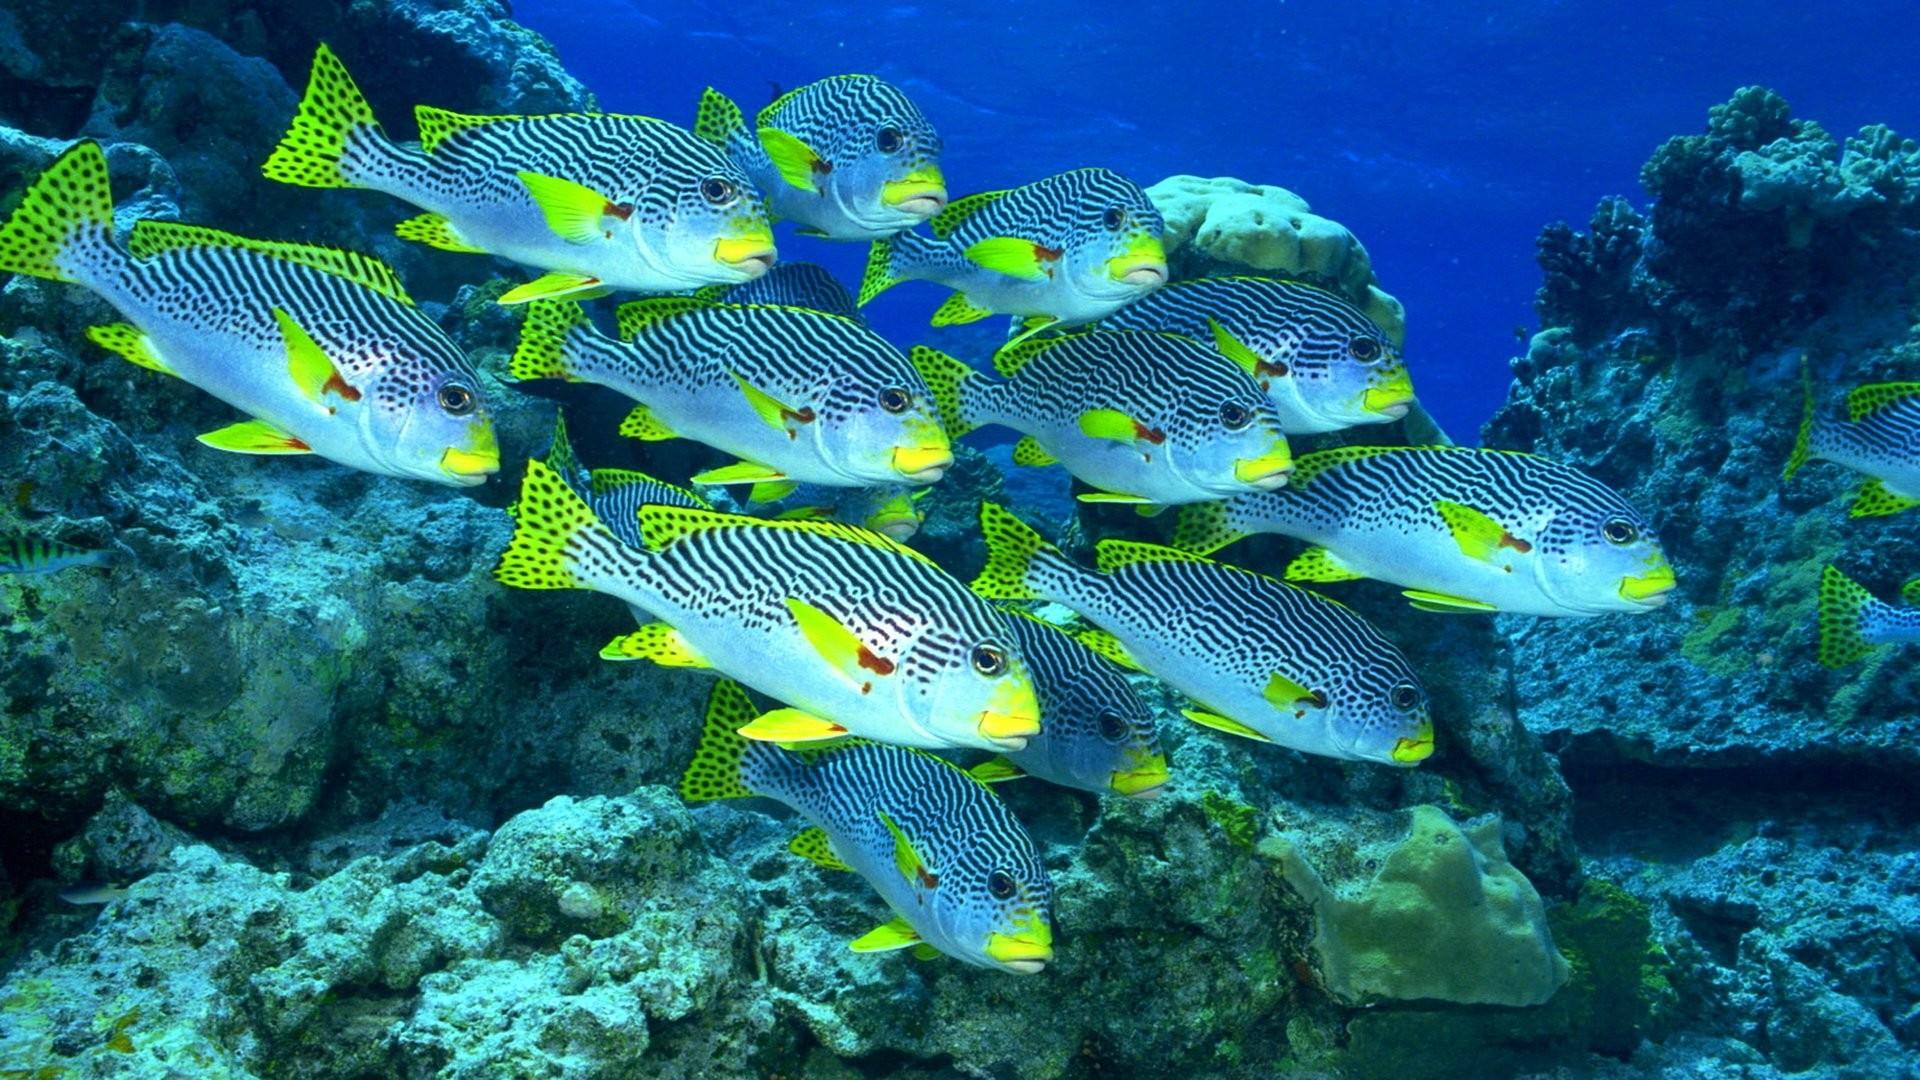 Fish Wallpaper Picture hd